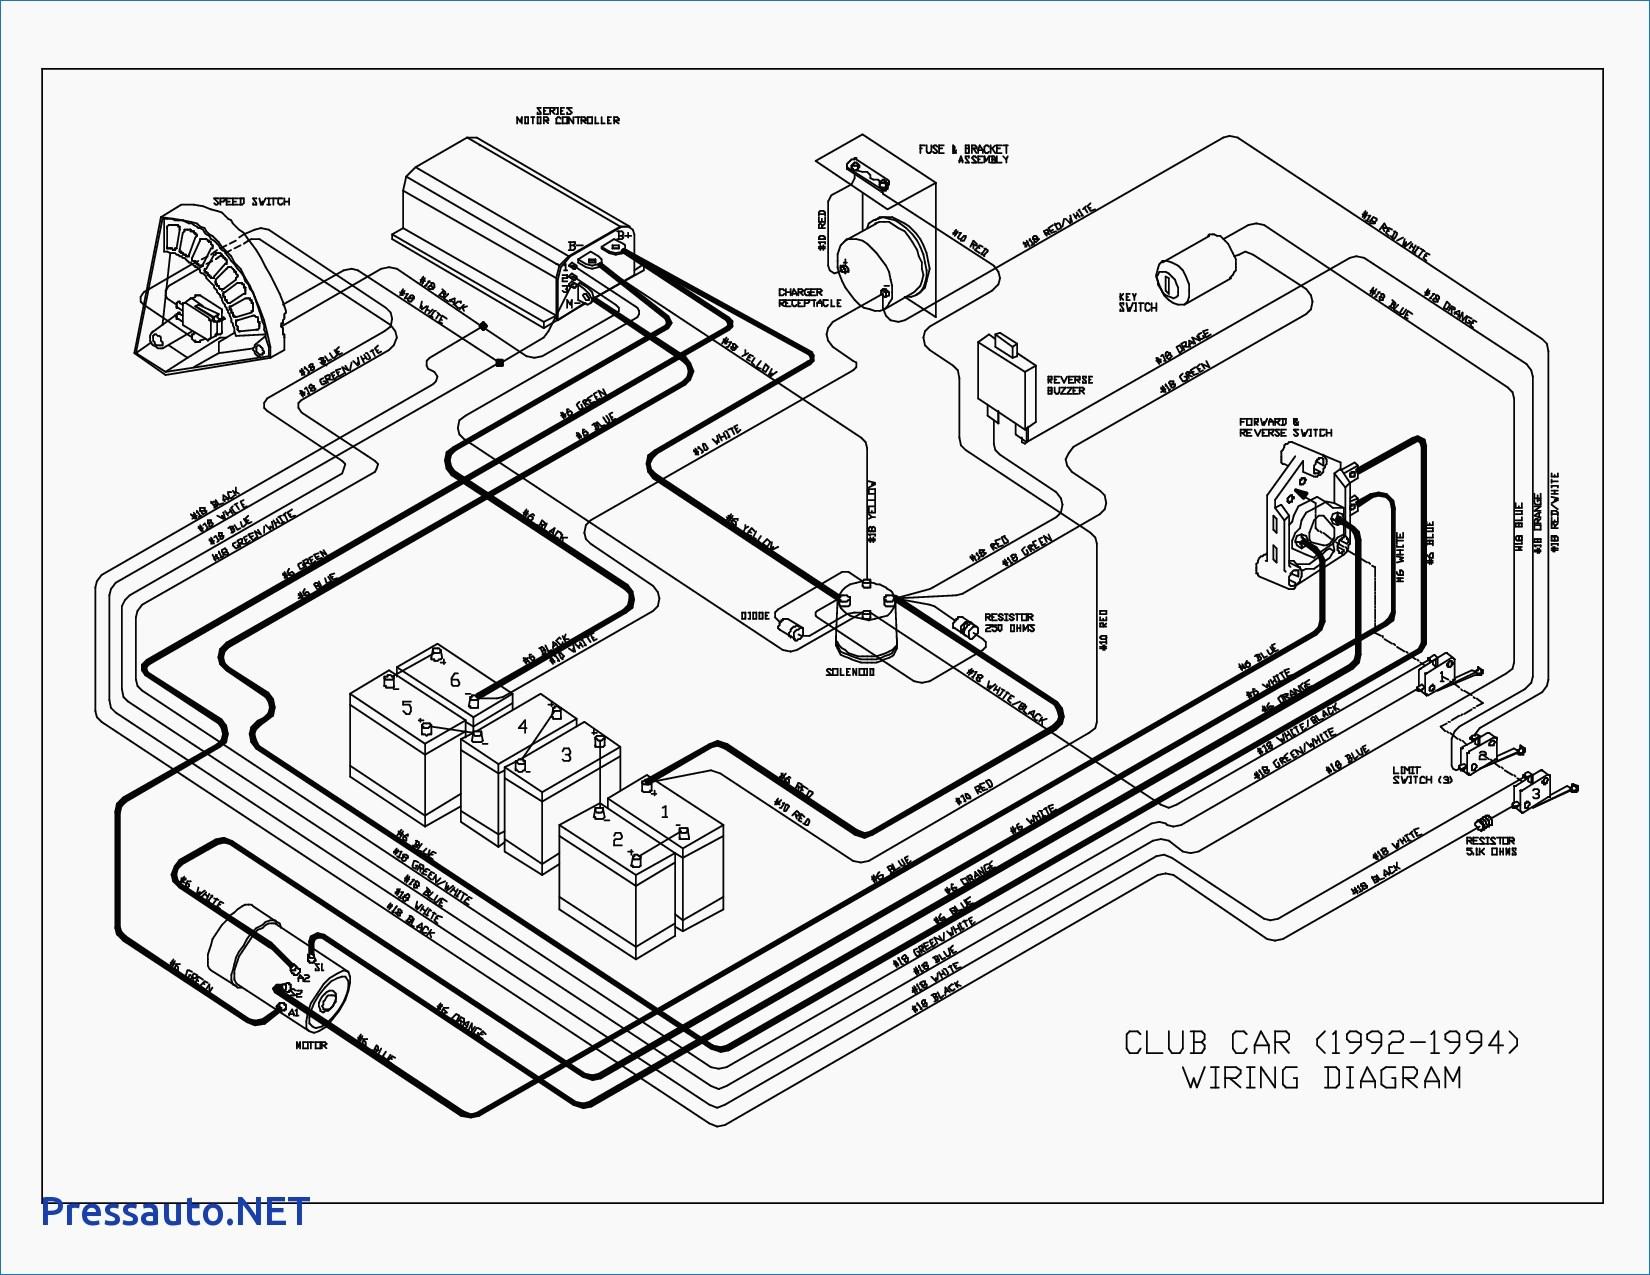 Battery Wiring For 2002 Club Car - Wiring Diagram Data - Club Car Wiring Diagram